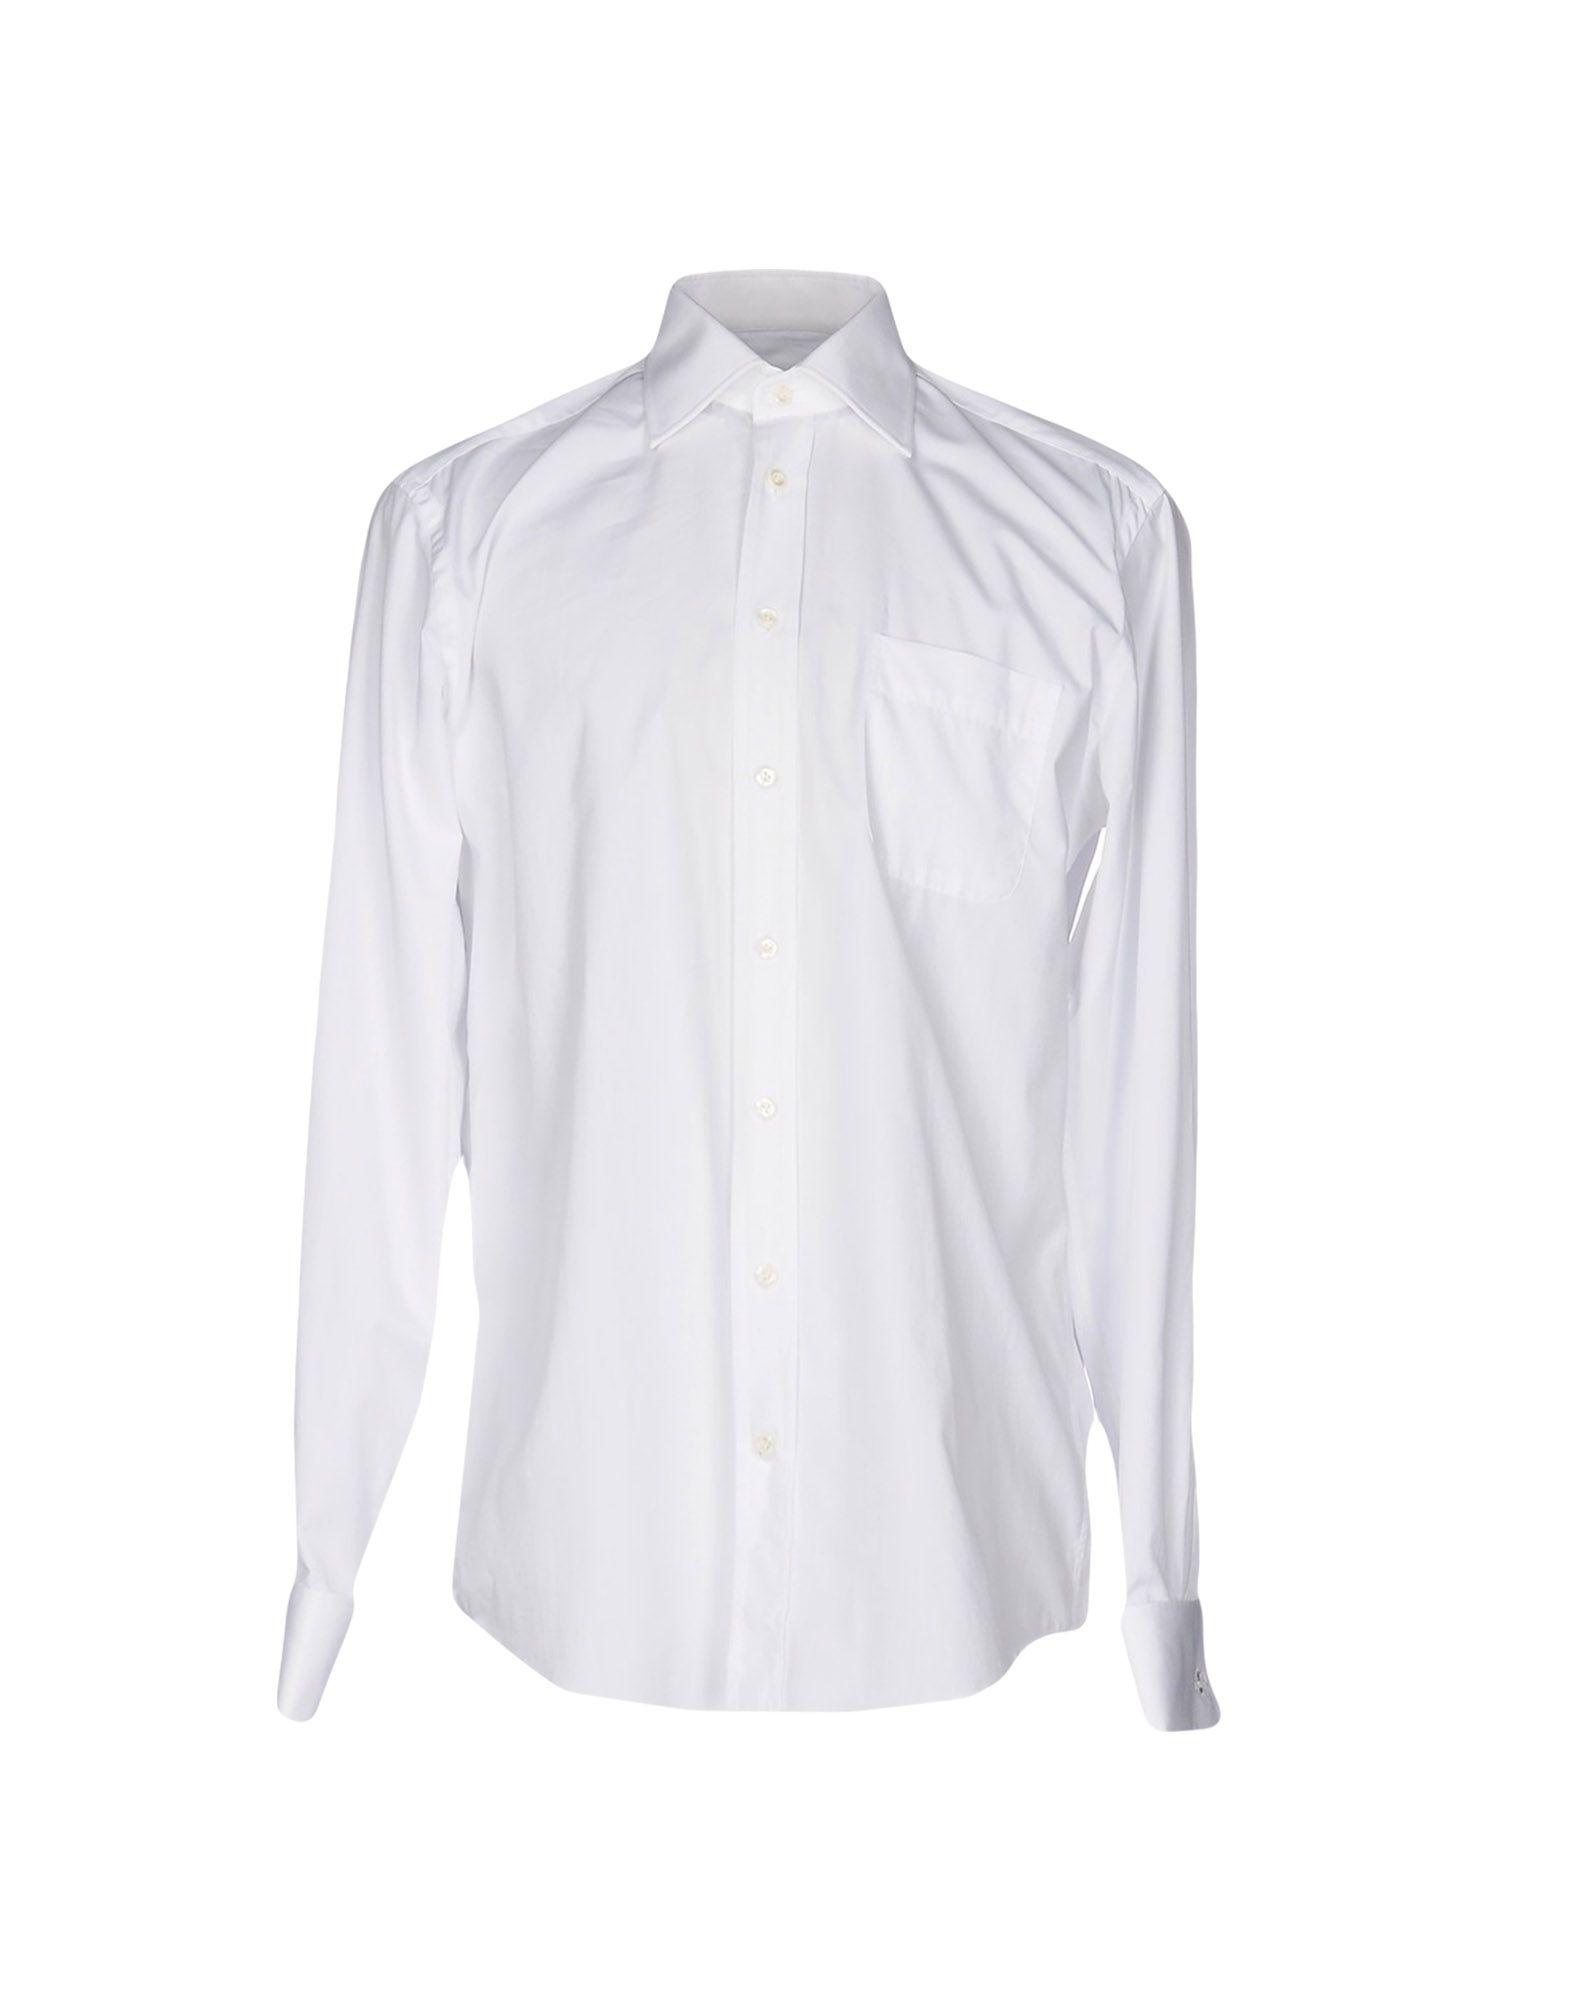 цена  VAN LAACK Pубашка  онлайн в 2017 году